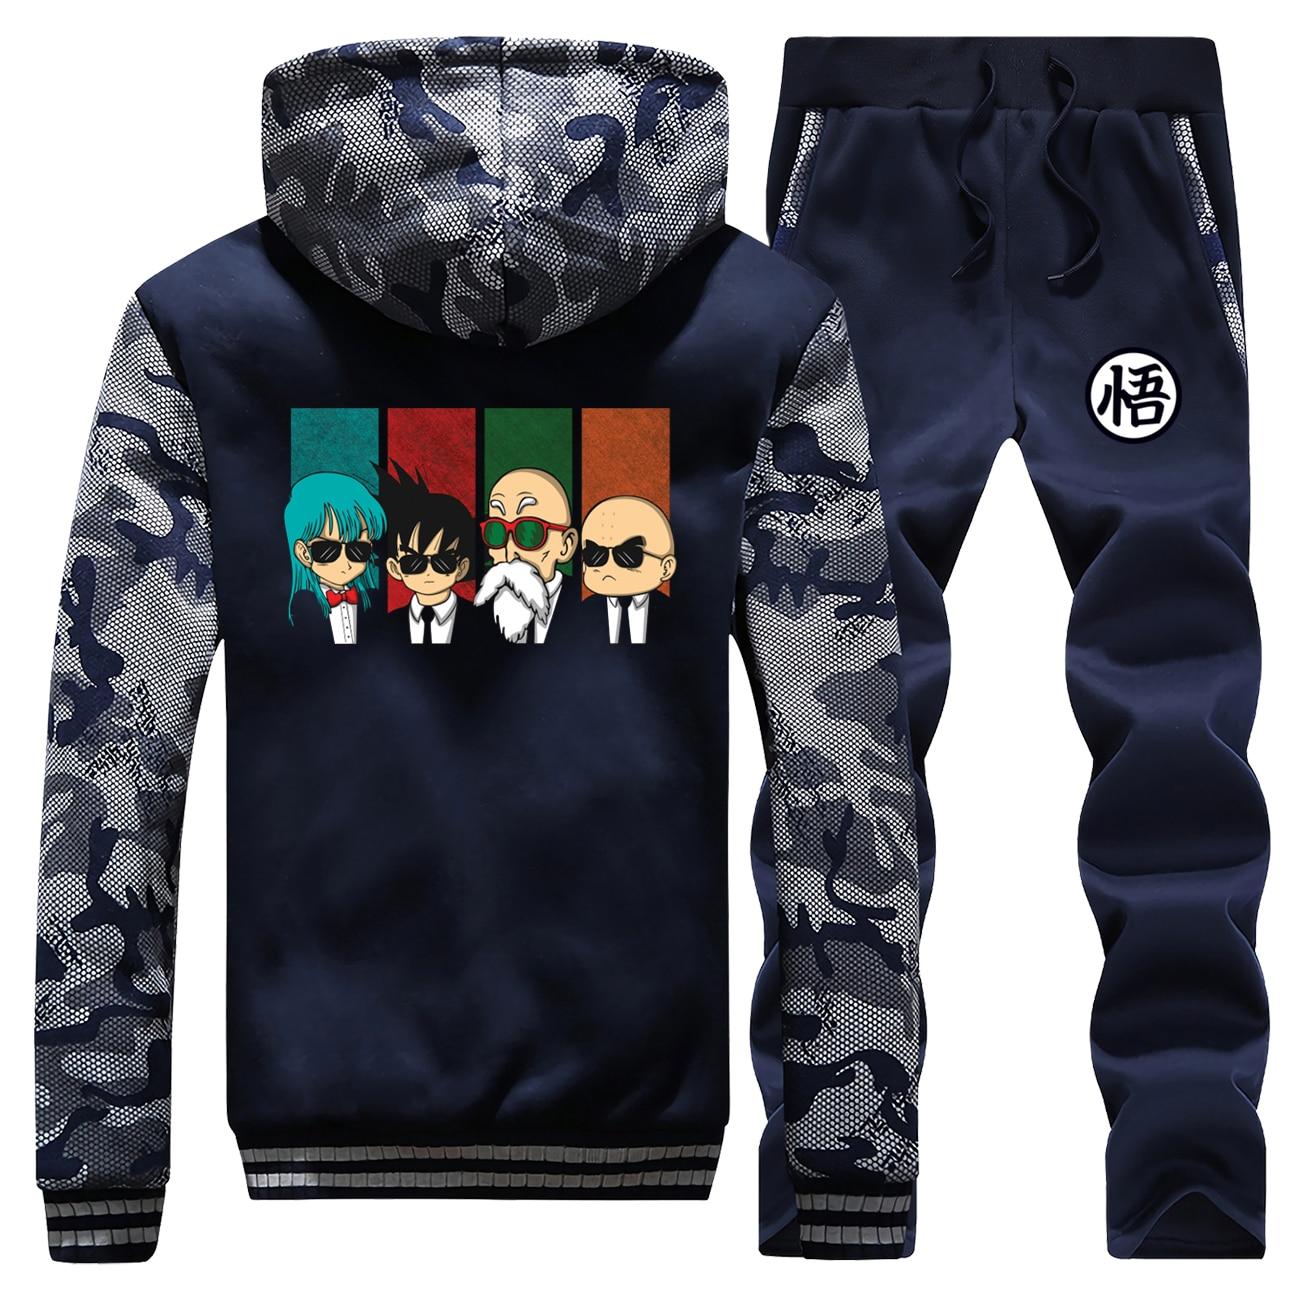 Men Winter Zip Jacket+Pants 2 Piece Sets Anime Dragon Ball Thick Hoodie Sweatshirt Funny Hip Hop Tracksuit New Design Hoodies